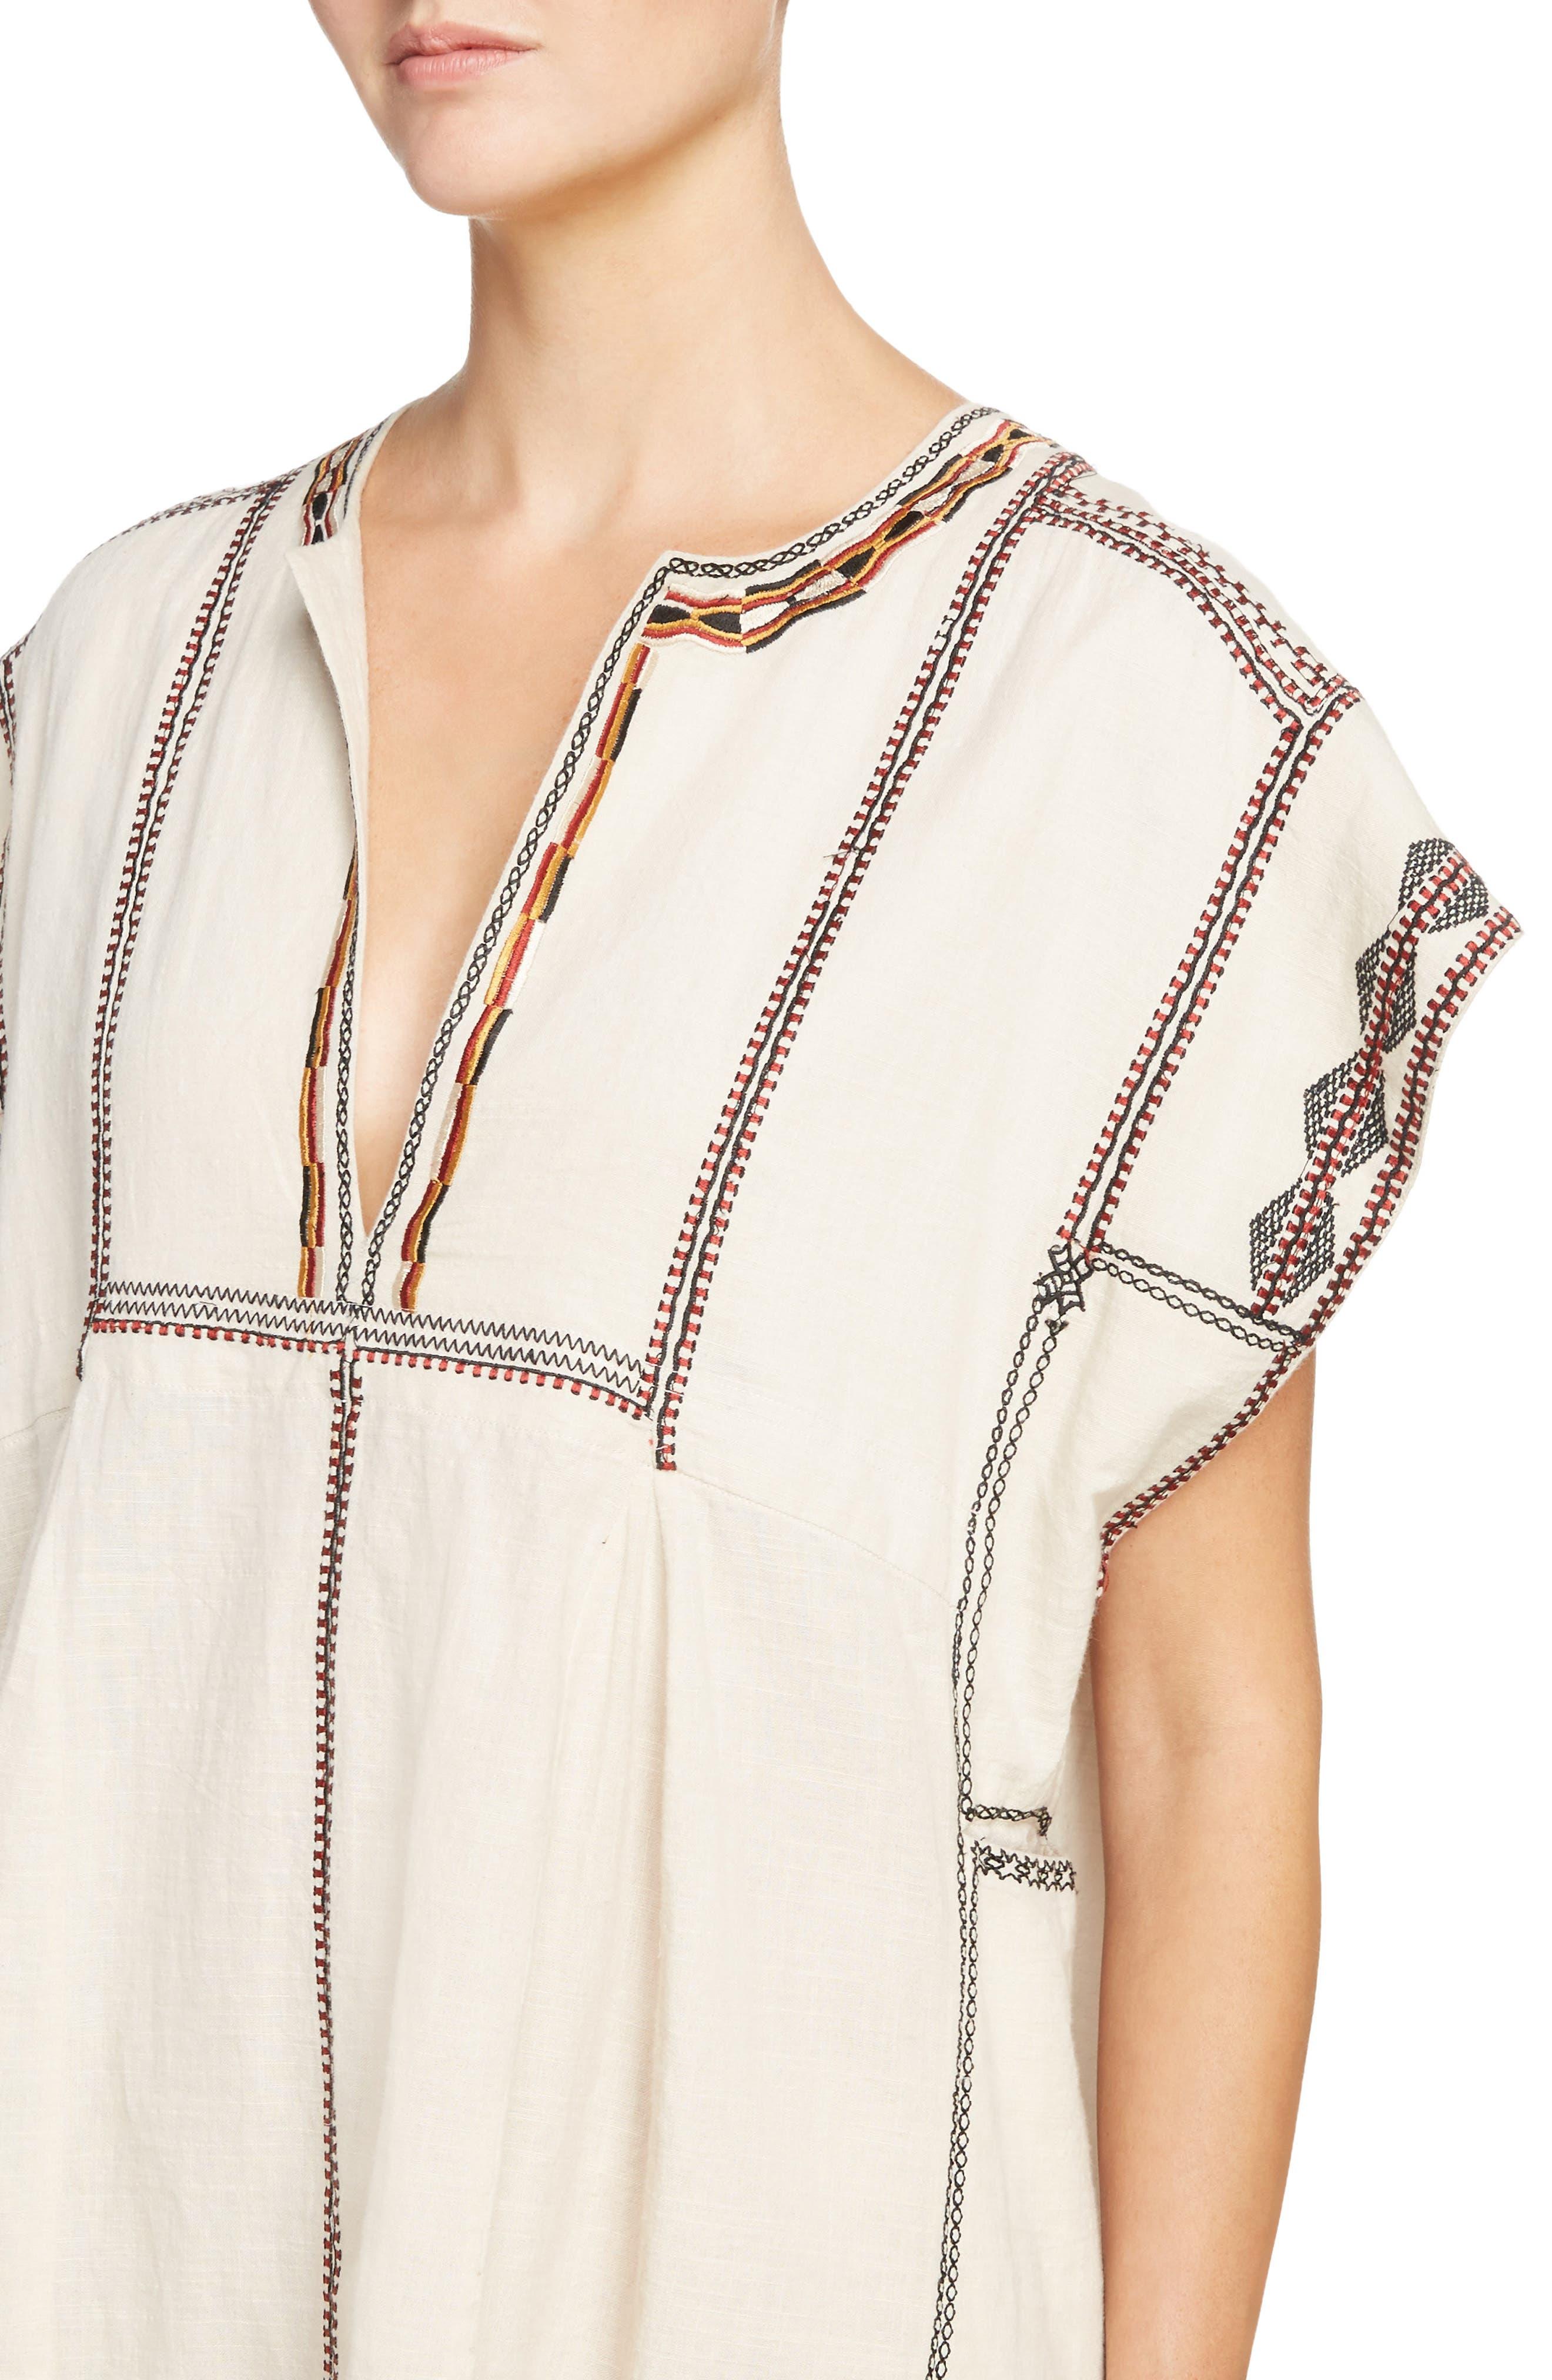 Belissa Embroidered Shift Dress,                             Alternate thumbnail 4, color,                             250